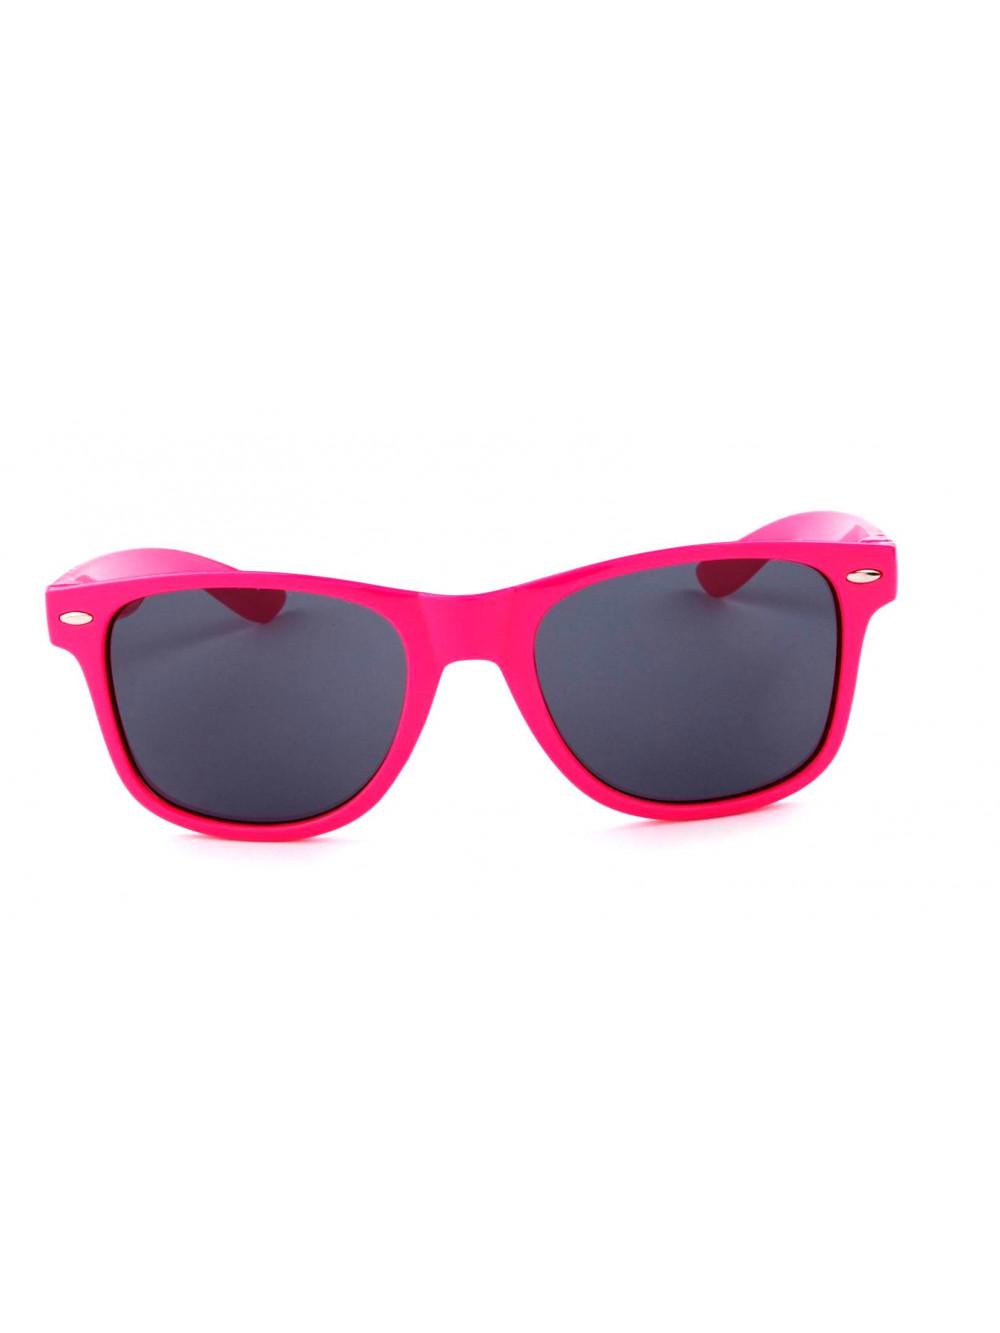 Slnečné okuliare Wayfarer Fancy Pink 5c48ad8c1e1